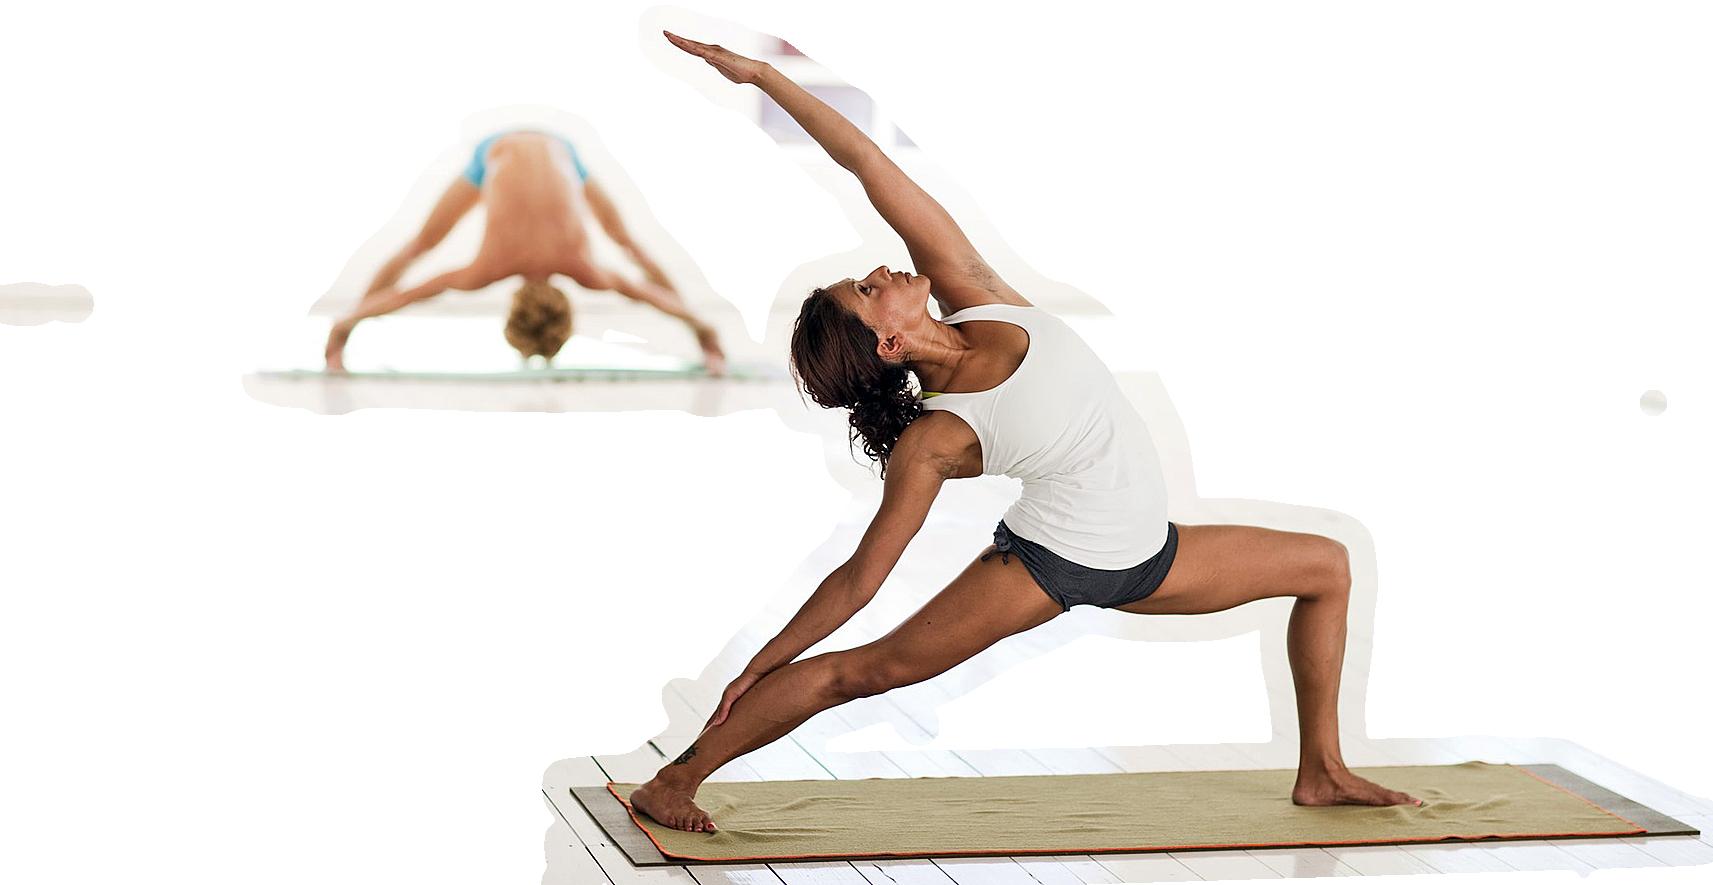 Yoga @ The Yoga Lounge - Yoga classes in Upper Boddington